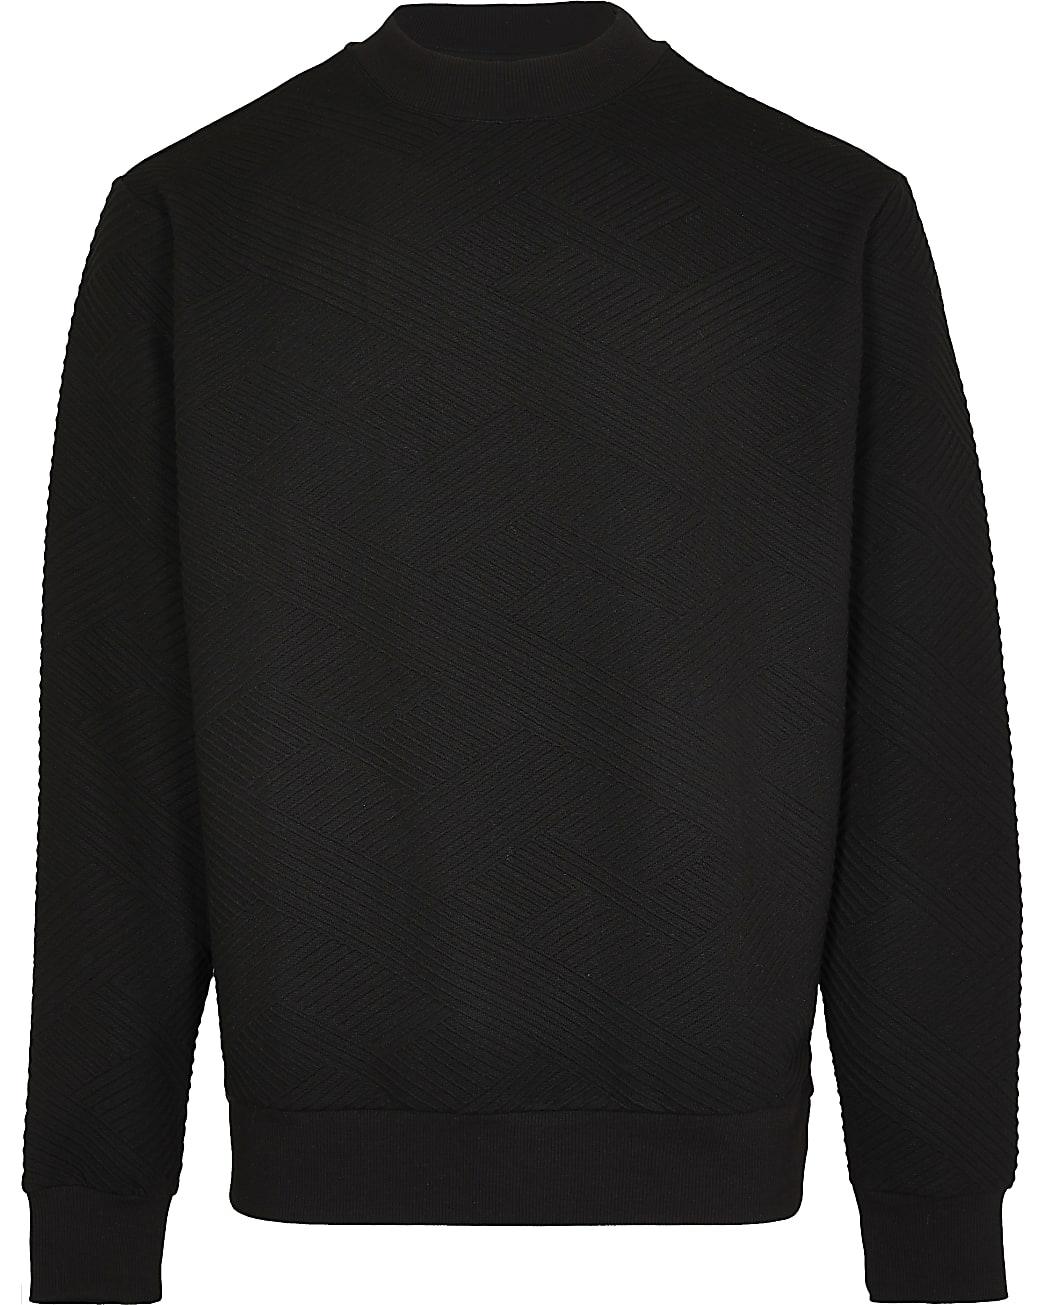 Black chevron textured sweatshirt